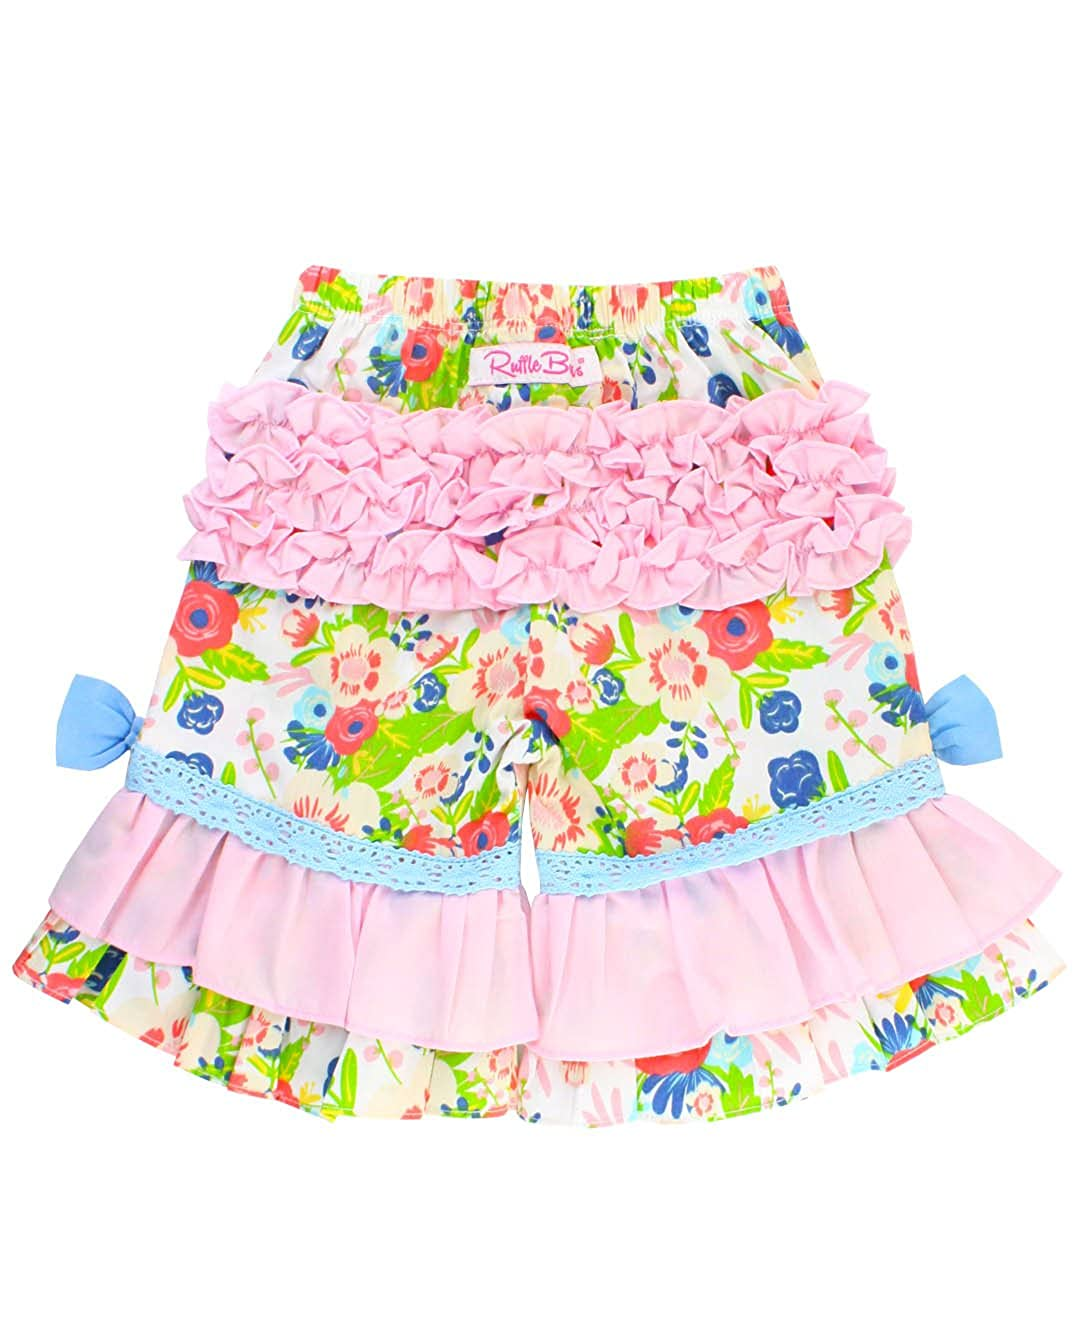 RuffleButts Little Girls Floral Print Ruffled Capri Pants RCWYYXX-CPRI-SC-TDLR